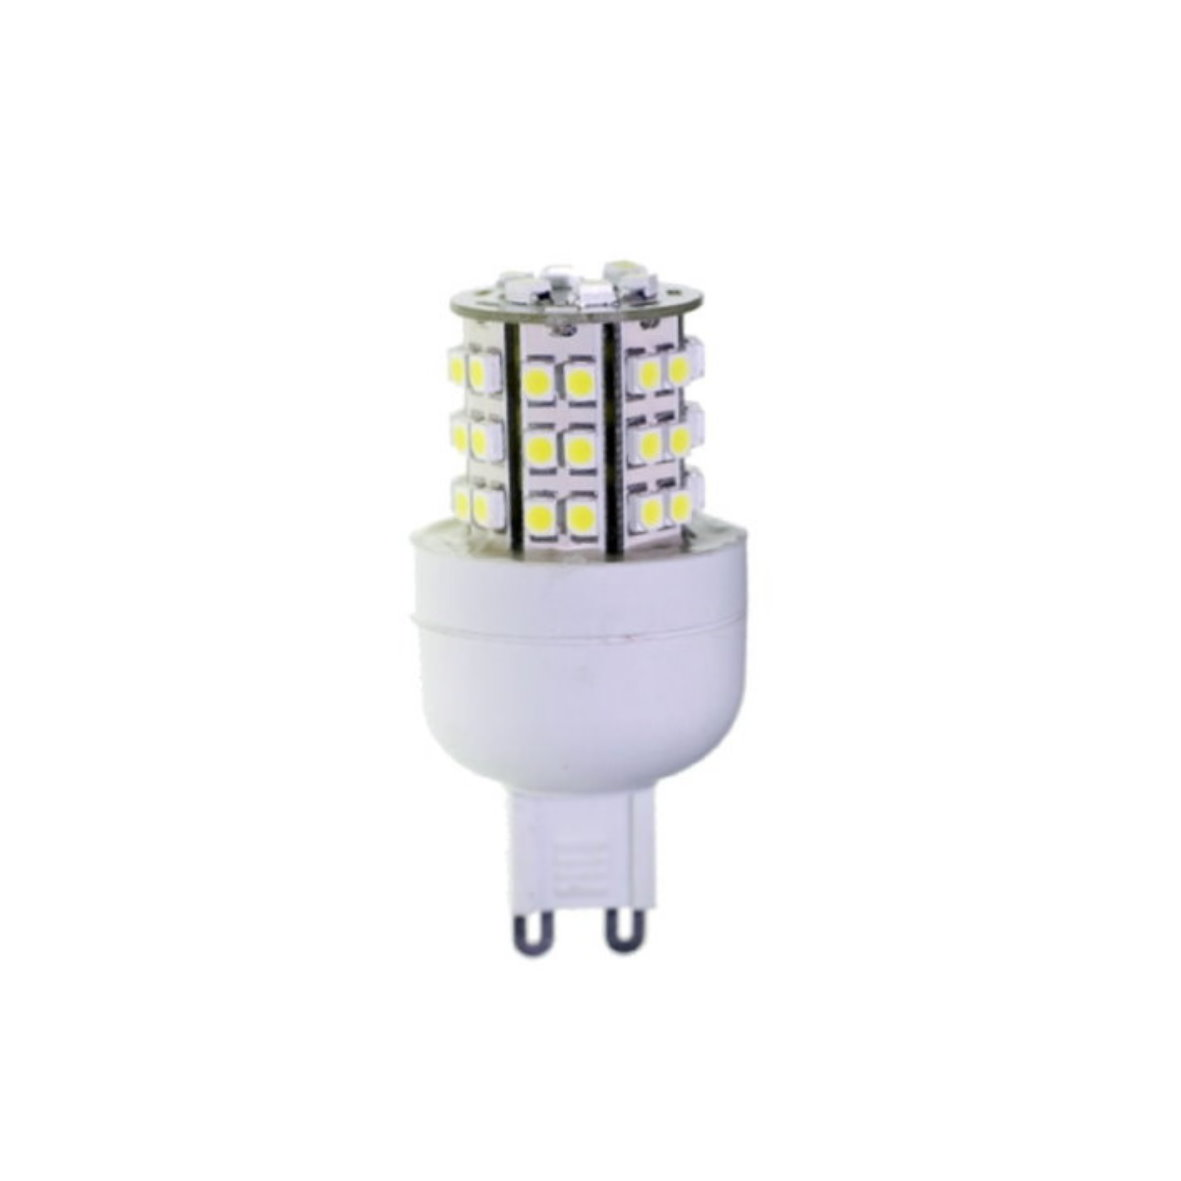 led smd g9 leuchtmittel dimmbar strahler spot mini wei. Black Bedroom Furniture Sets. Home Design Ideas